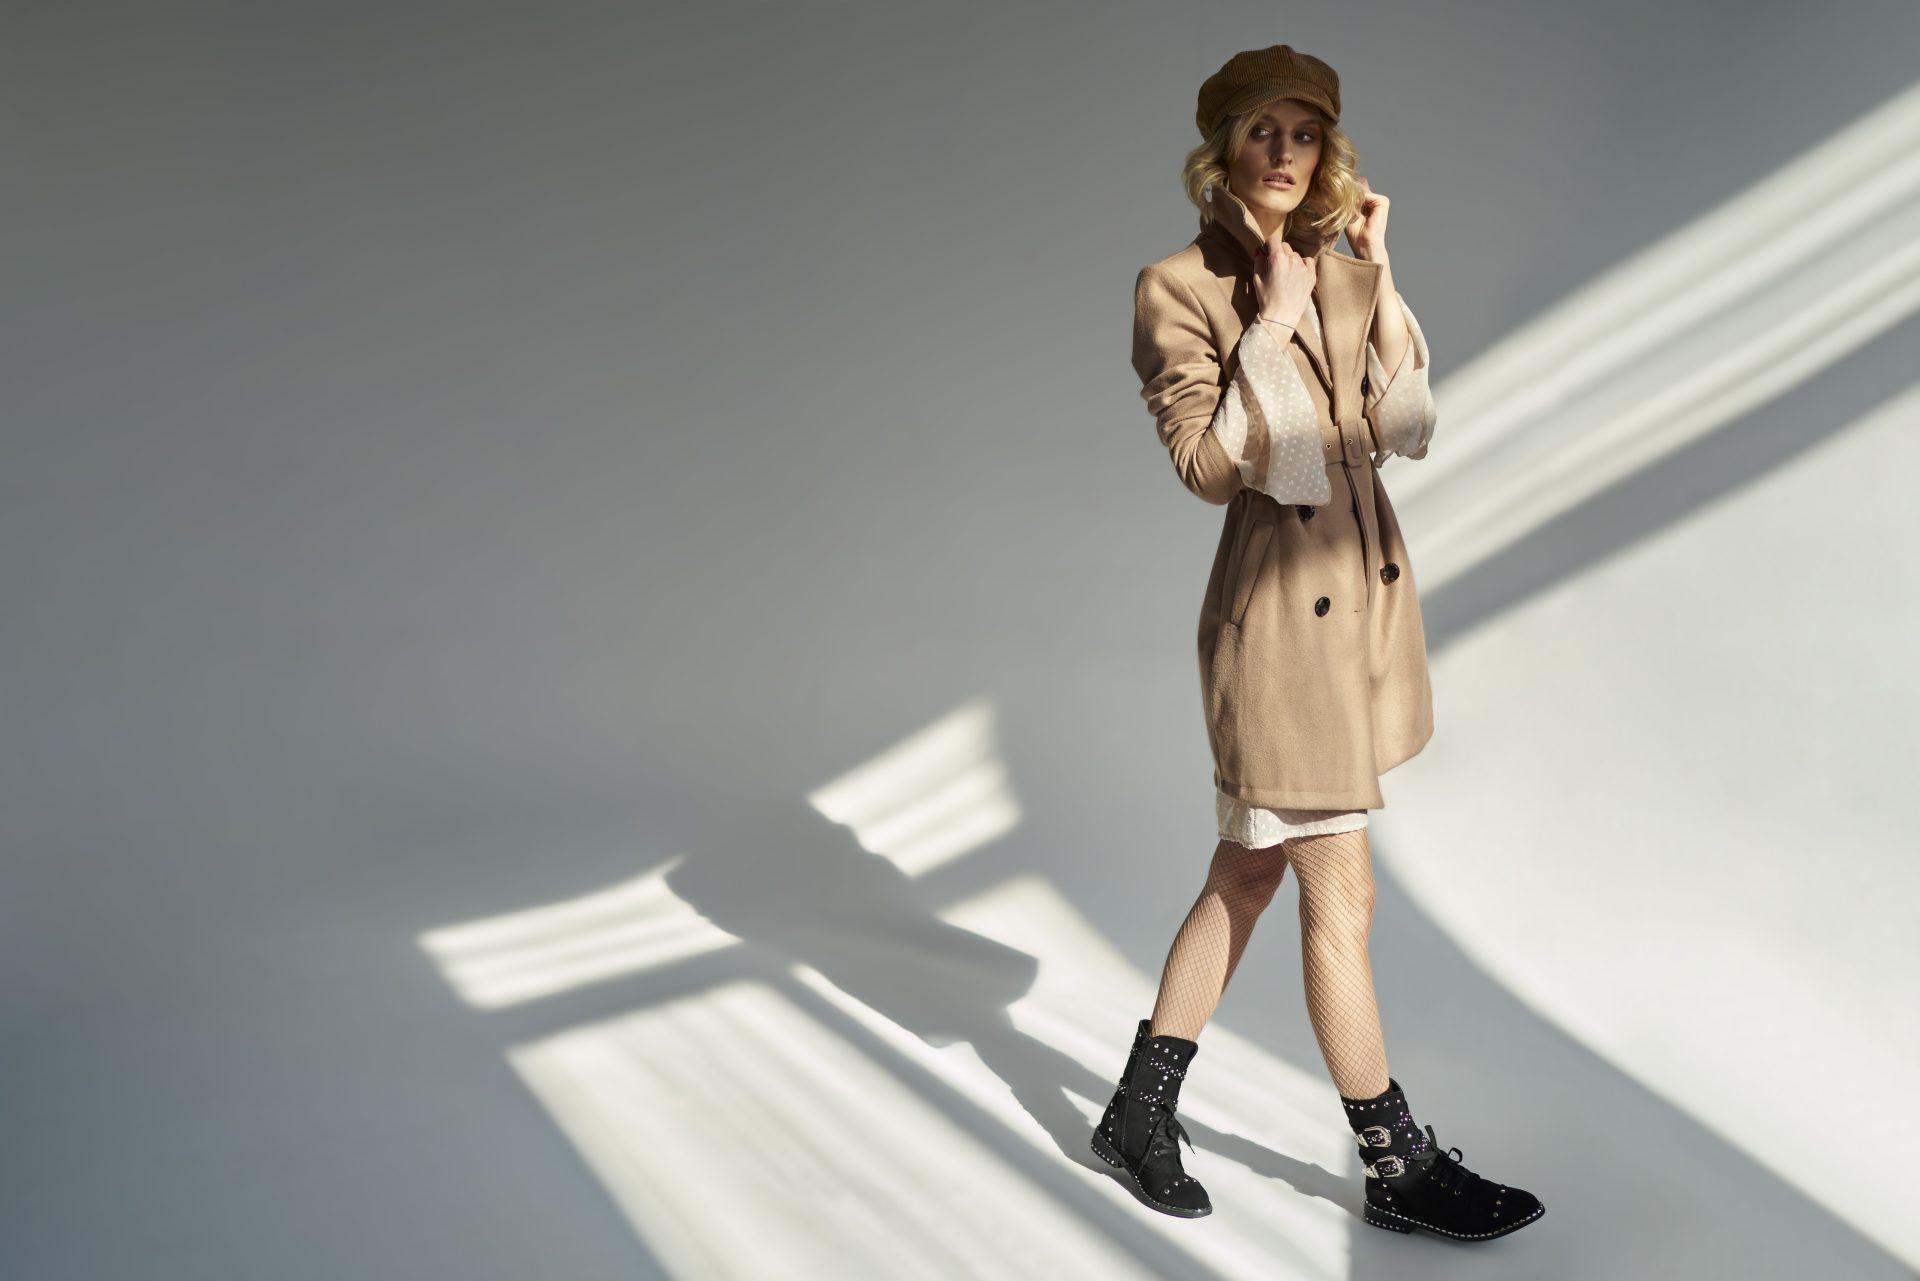 Kaszkiet damski - jak nosić ten modny dodatek?